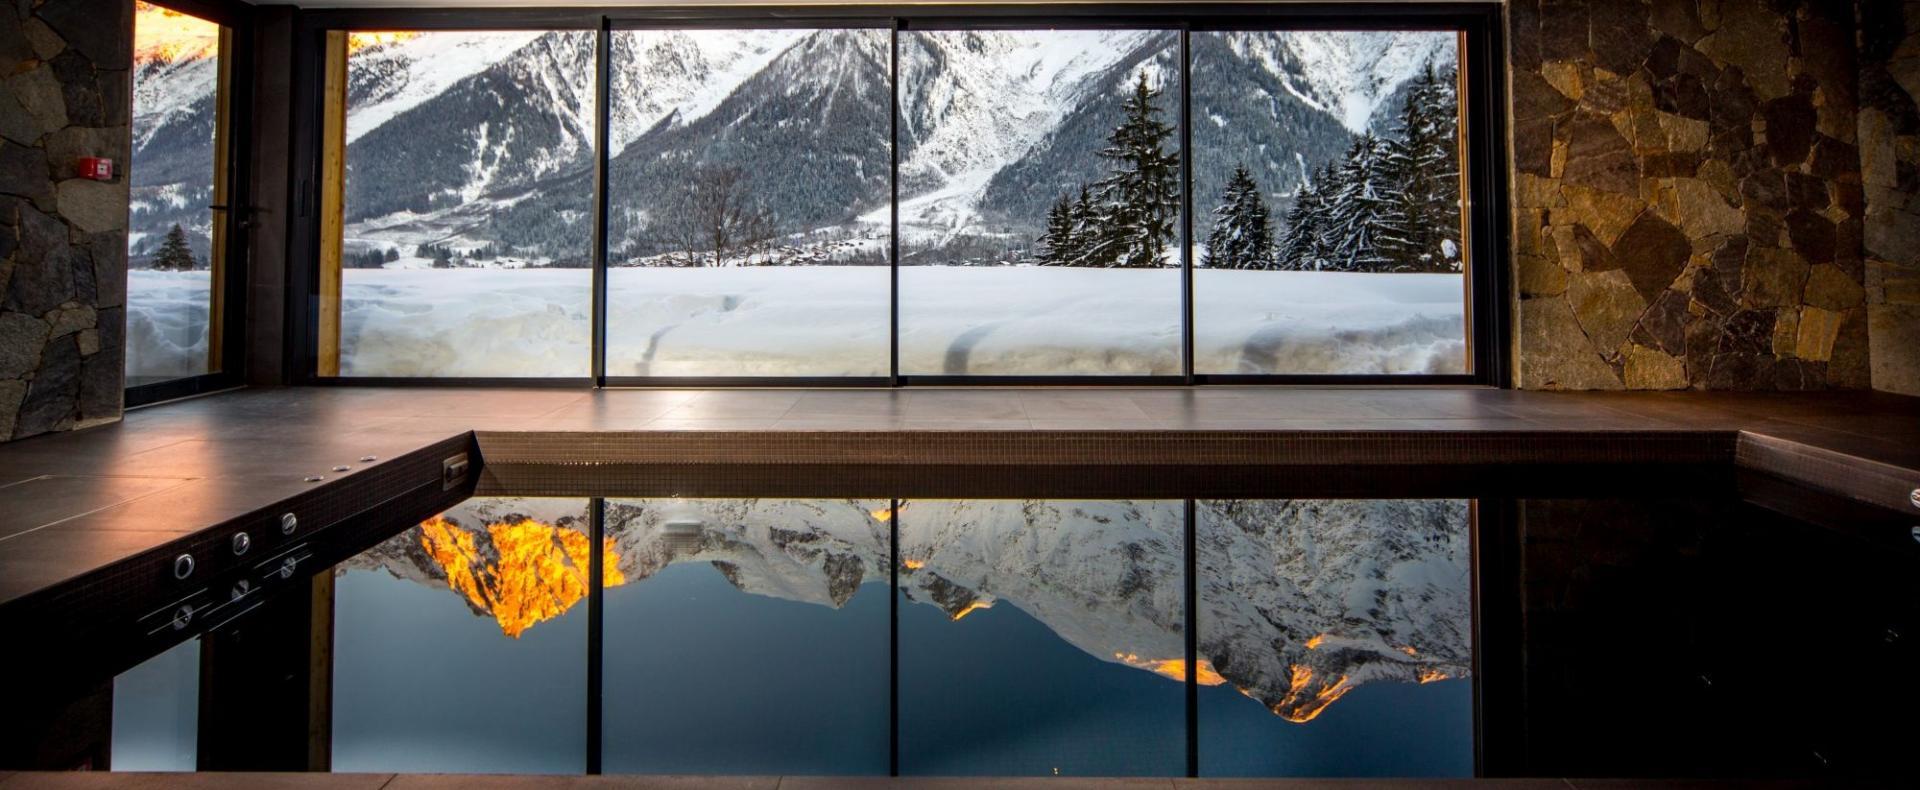 Pool-Le-Chalet-Mont-Blanc-Chamonix-Ultimate-Luxury-Chalets-UltraVilla